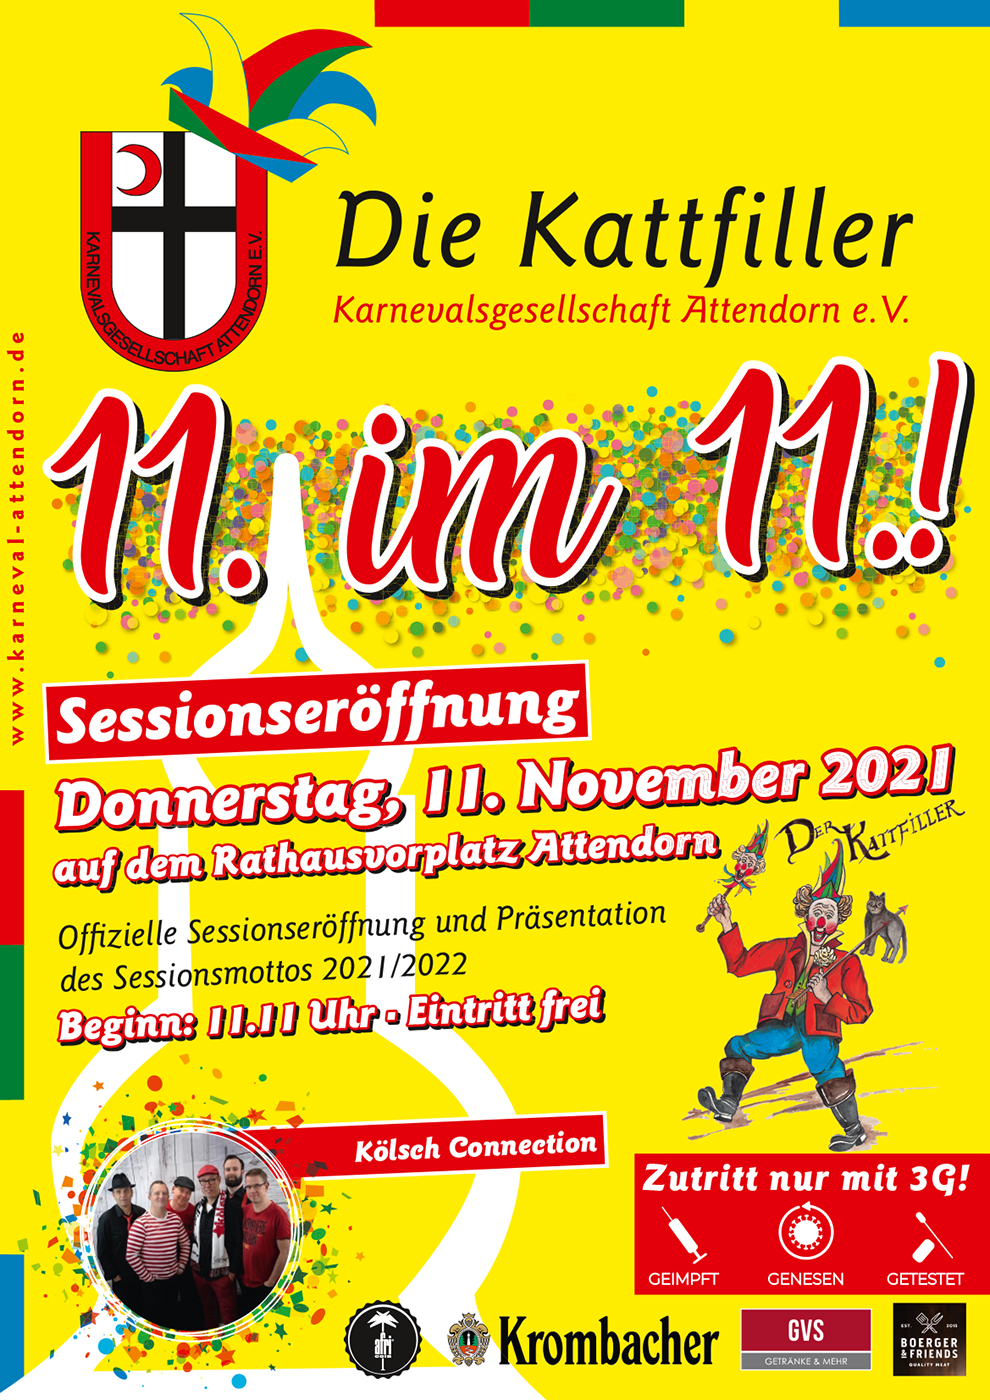 Sessionseröffnung 2021 - Die Kattfiller Karnevalsgesellschaft Attendorn